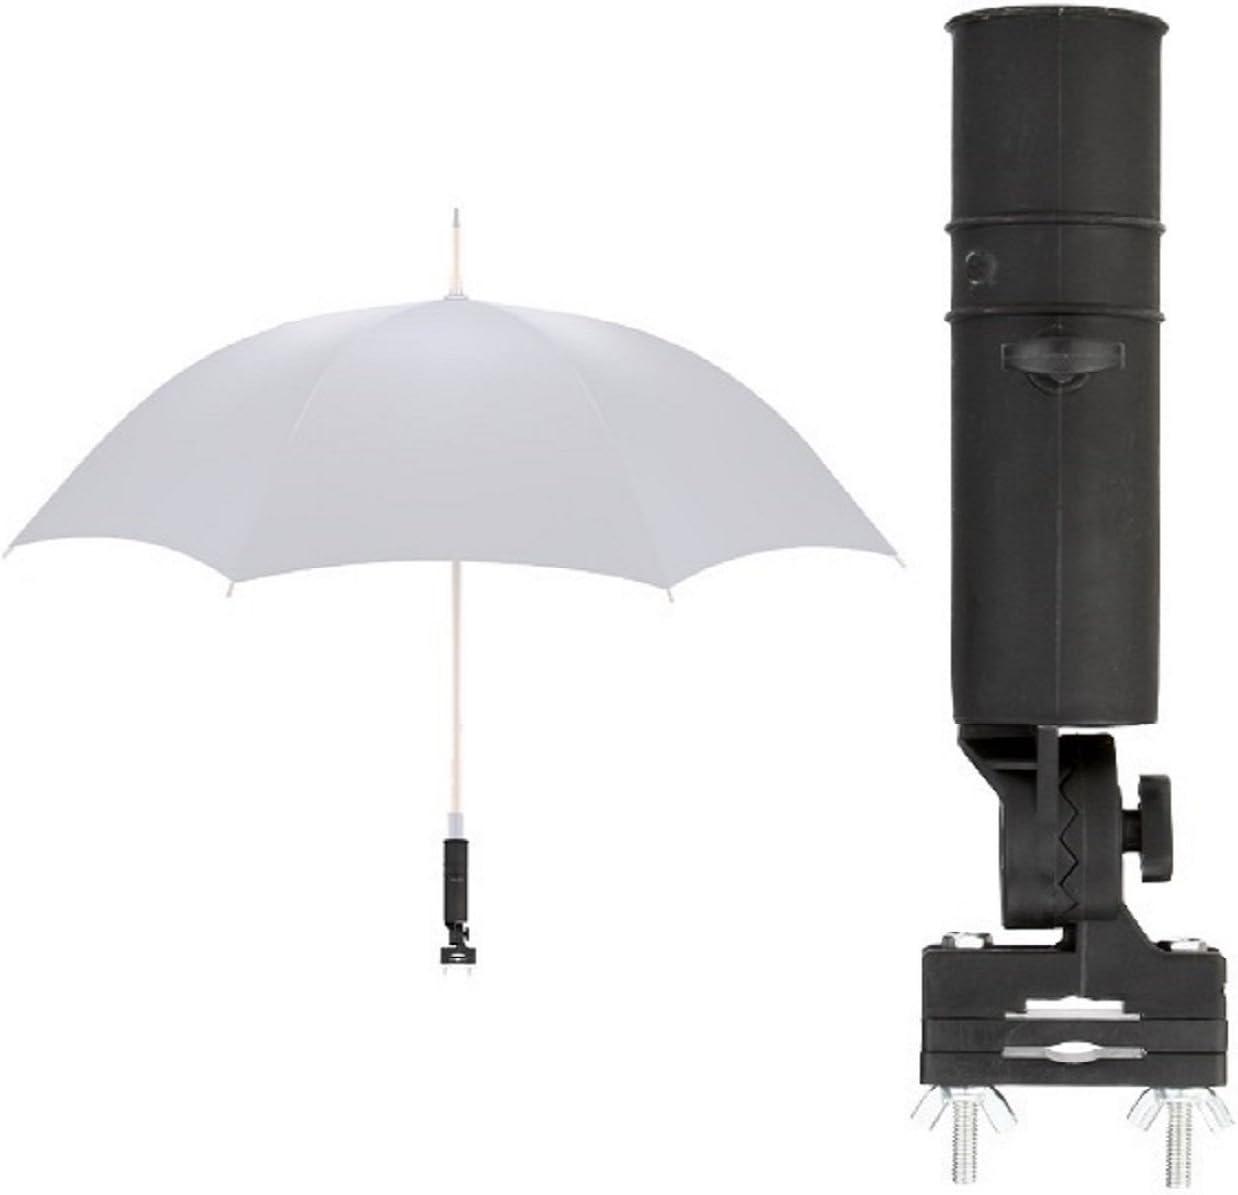 LL-Golf Universal Soporte para Paraguas para Silla/Carrito/Andador/Paraguas Soporte/Umbrella Holder